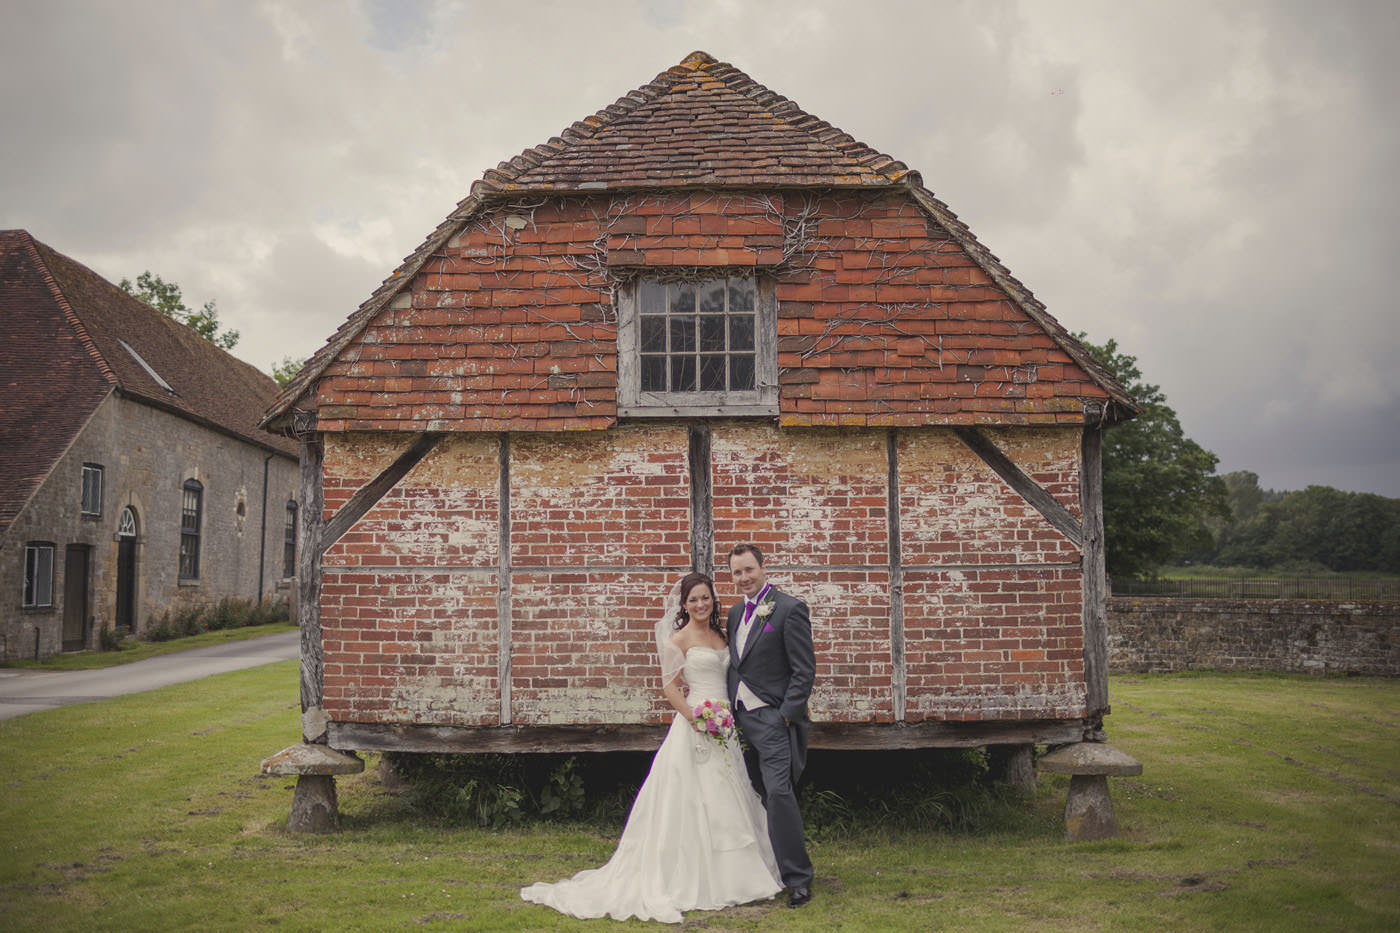 chrissarah walled garden midhurst wedding photographer 0080